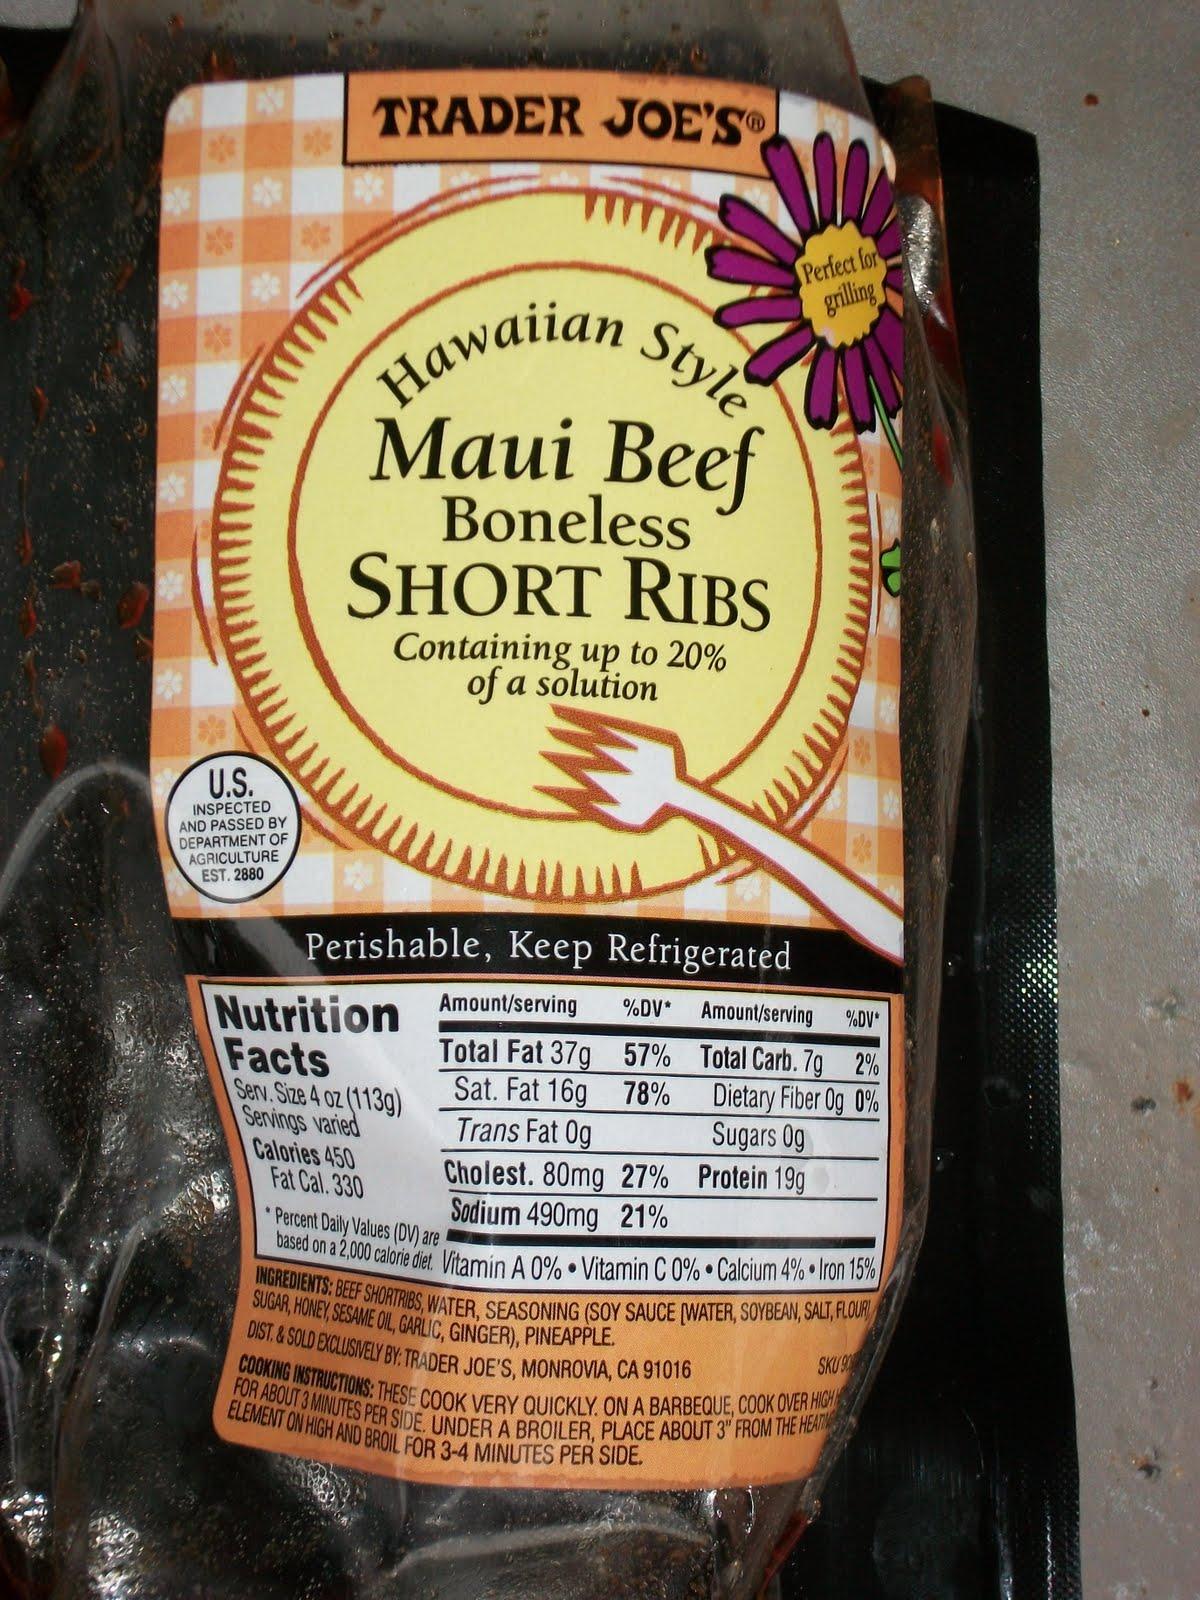 ... com and their hawaiian style maui beef boneless short ribs the